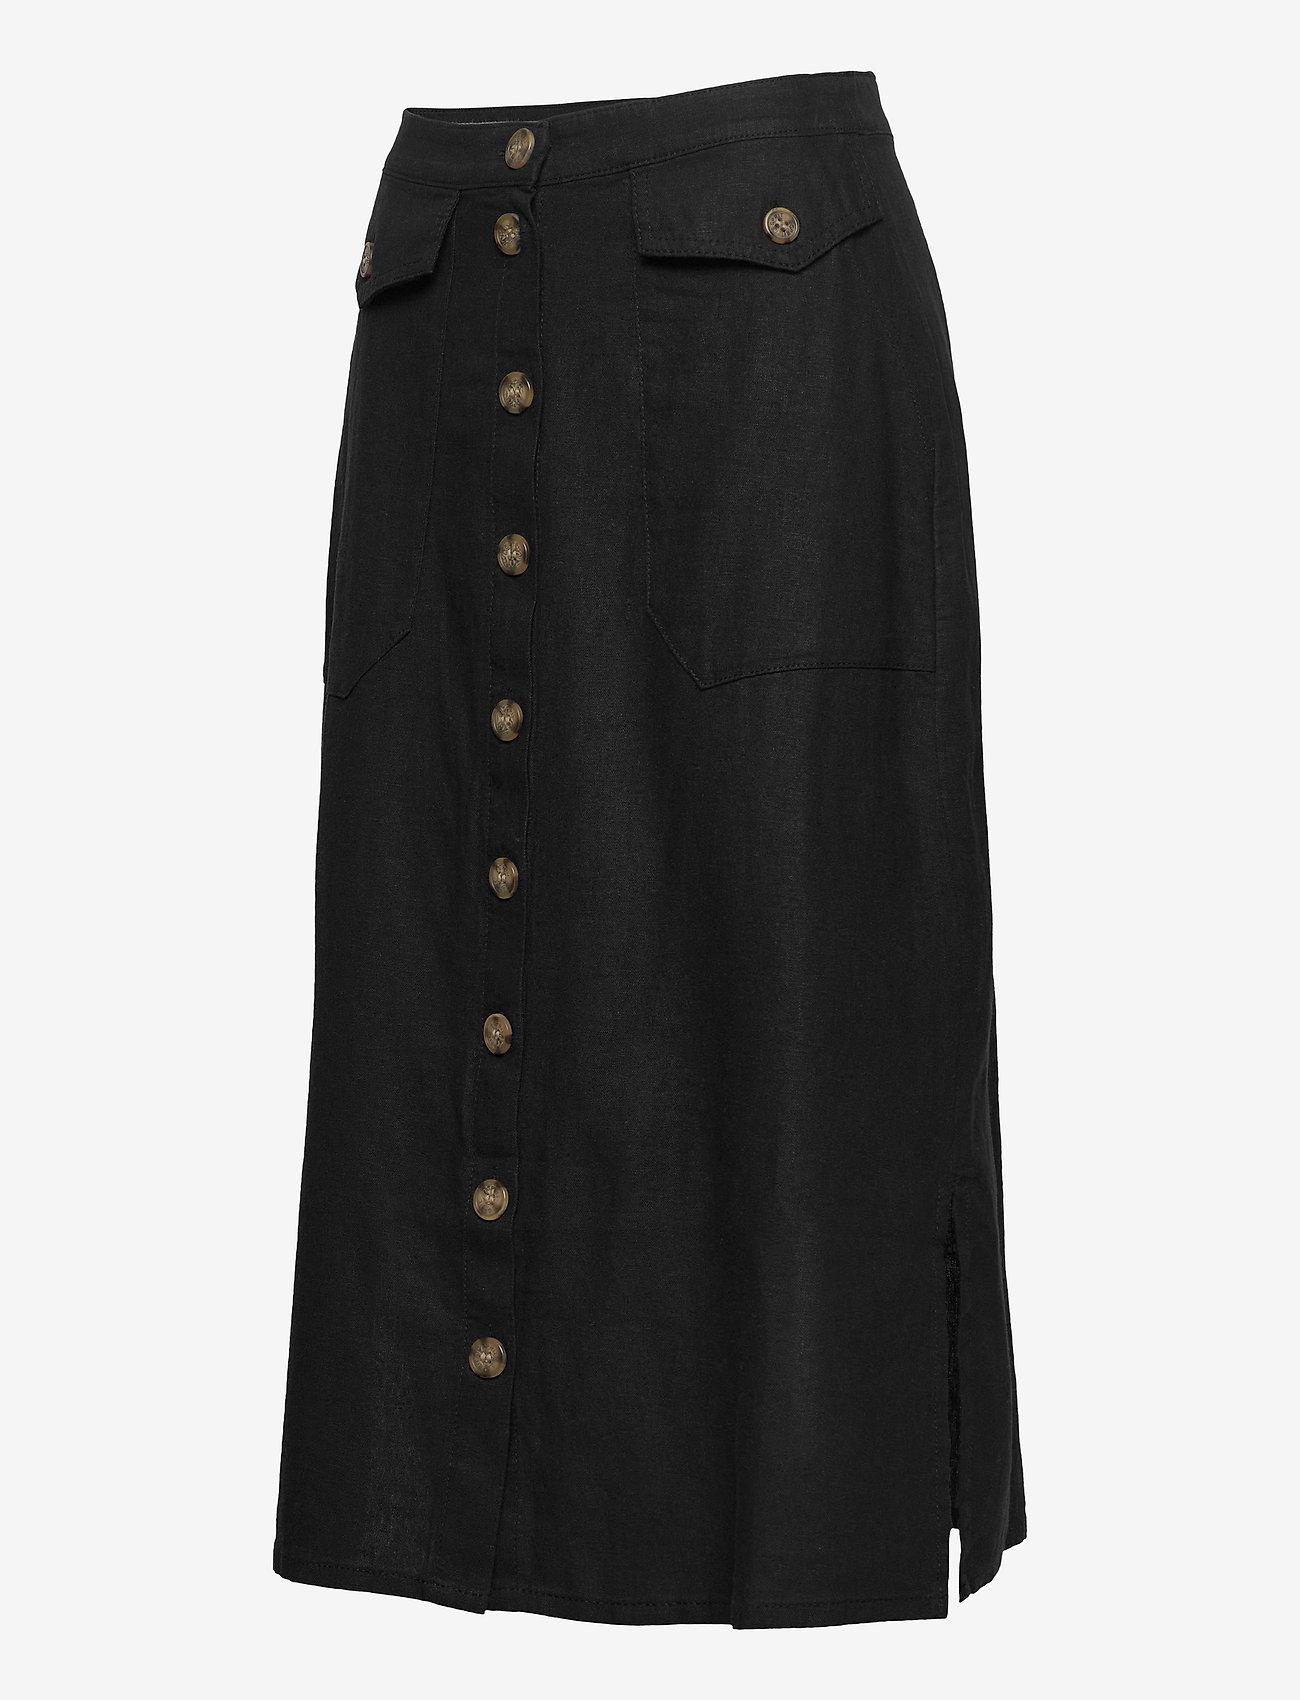 Skirts Light Woven (Black) (419.99 kr) - Esprit Casual